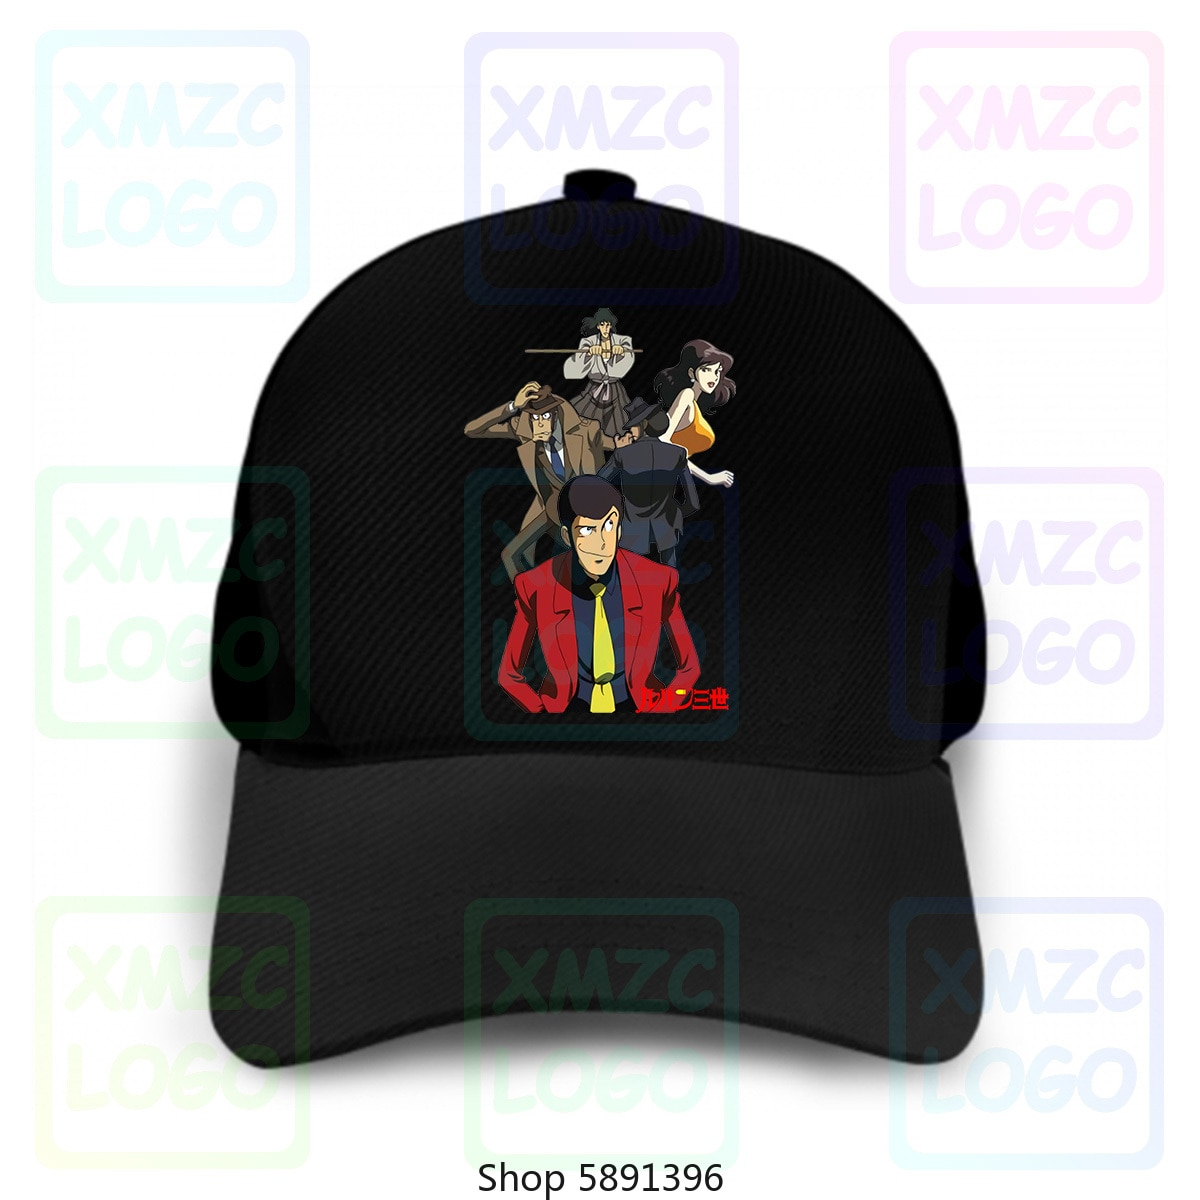 Atmungsakants Lupin Iii cartón de Lupin Iii años 80-Myth - 2-S-M-L - Xl gorra de béisbol sombreros mujeres hombres